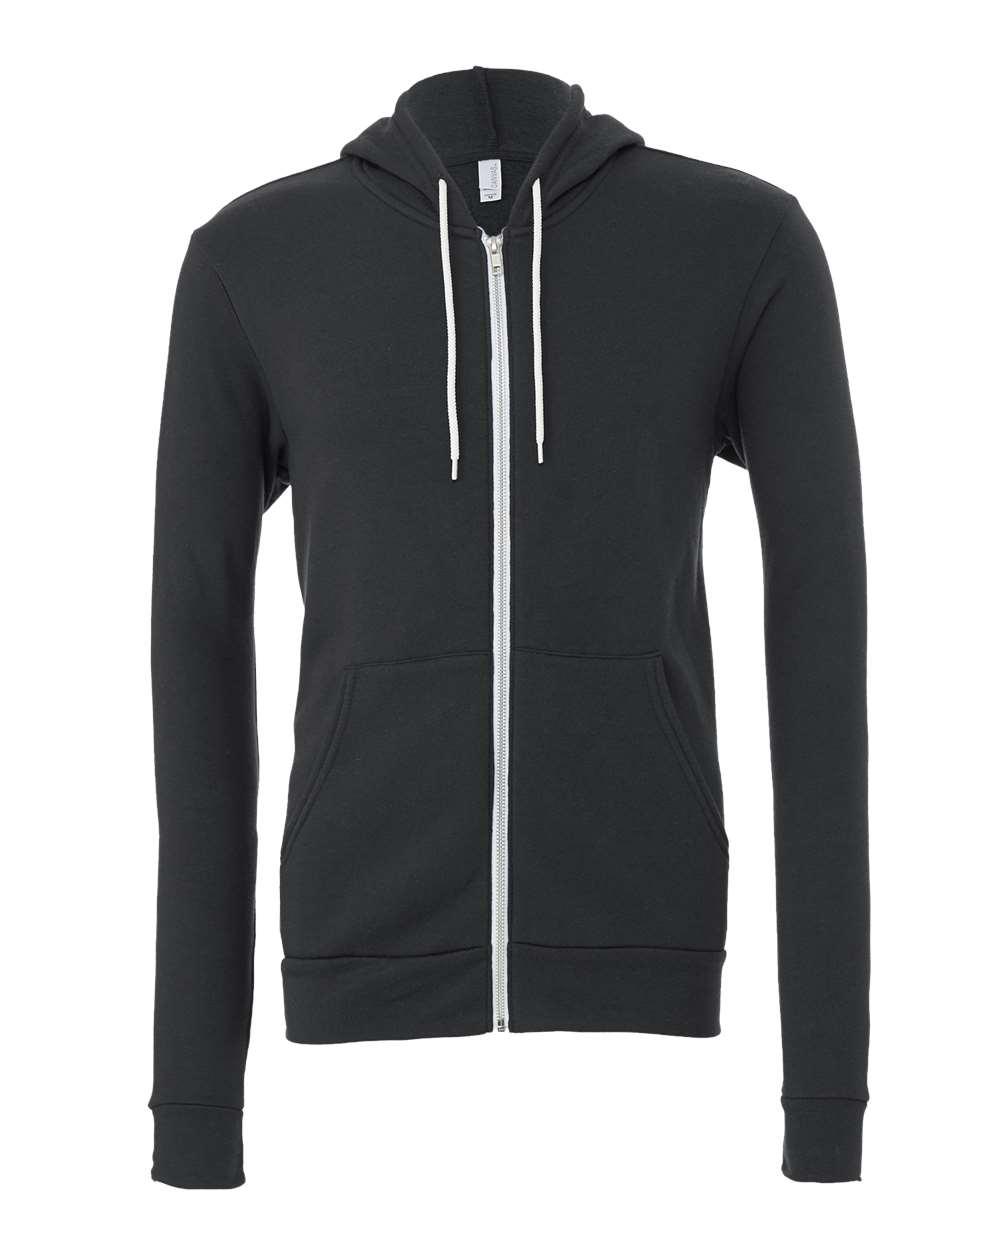 Bella-Canvas-Unisex-Full-Zip-Up-Hooded-Sweatshirt-Blank-Hoodie-3739-up-to-3XL thumbnail 15